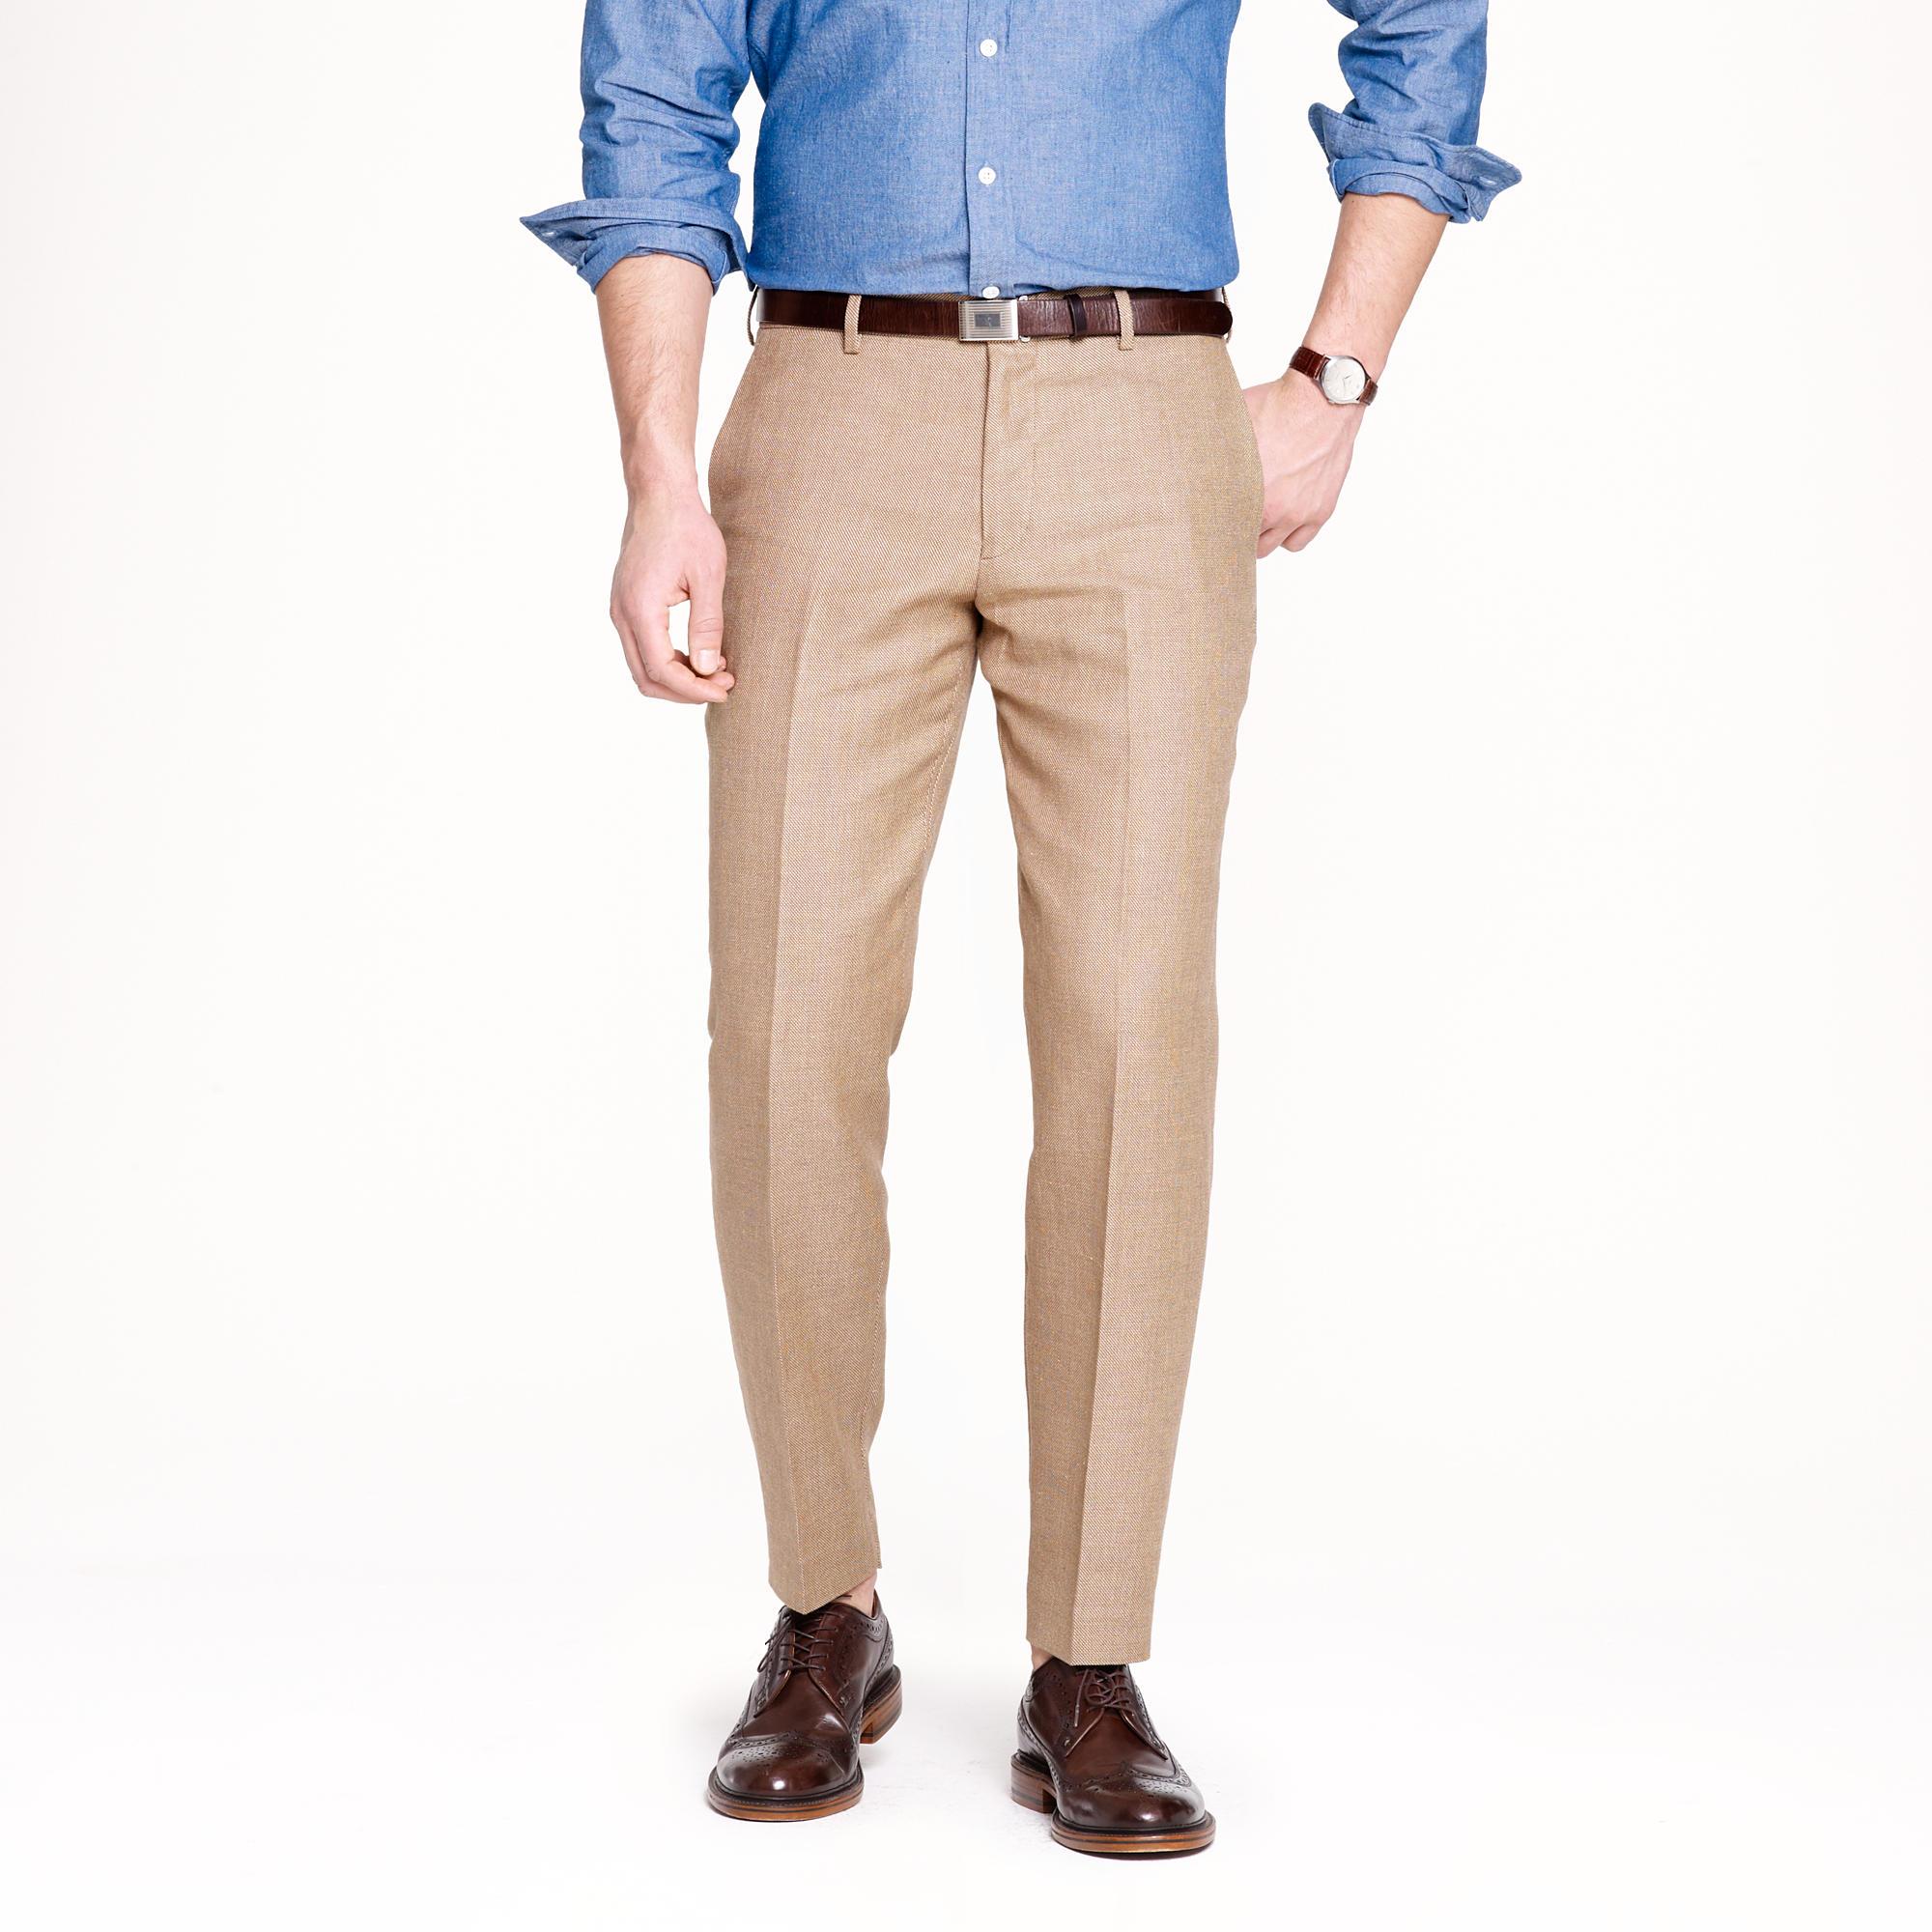 Ludlow slim suit pant in Italian linen-cotton : | J.Crew